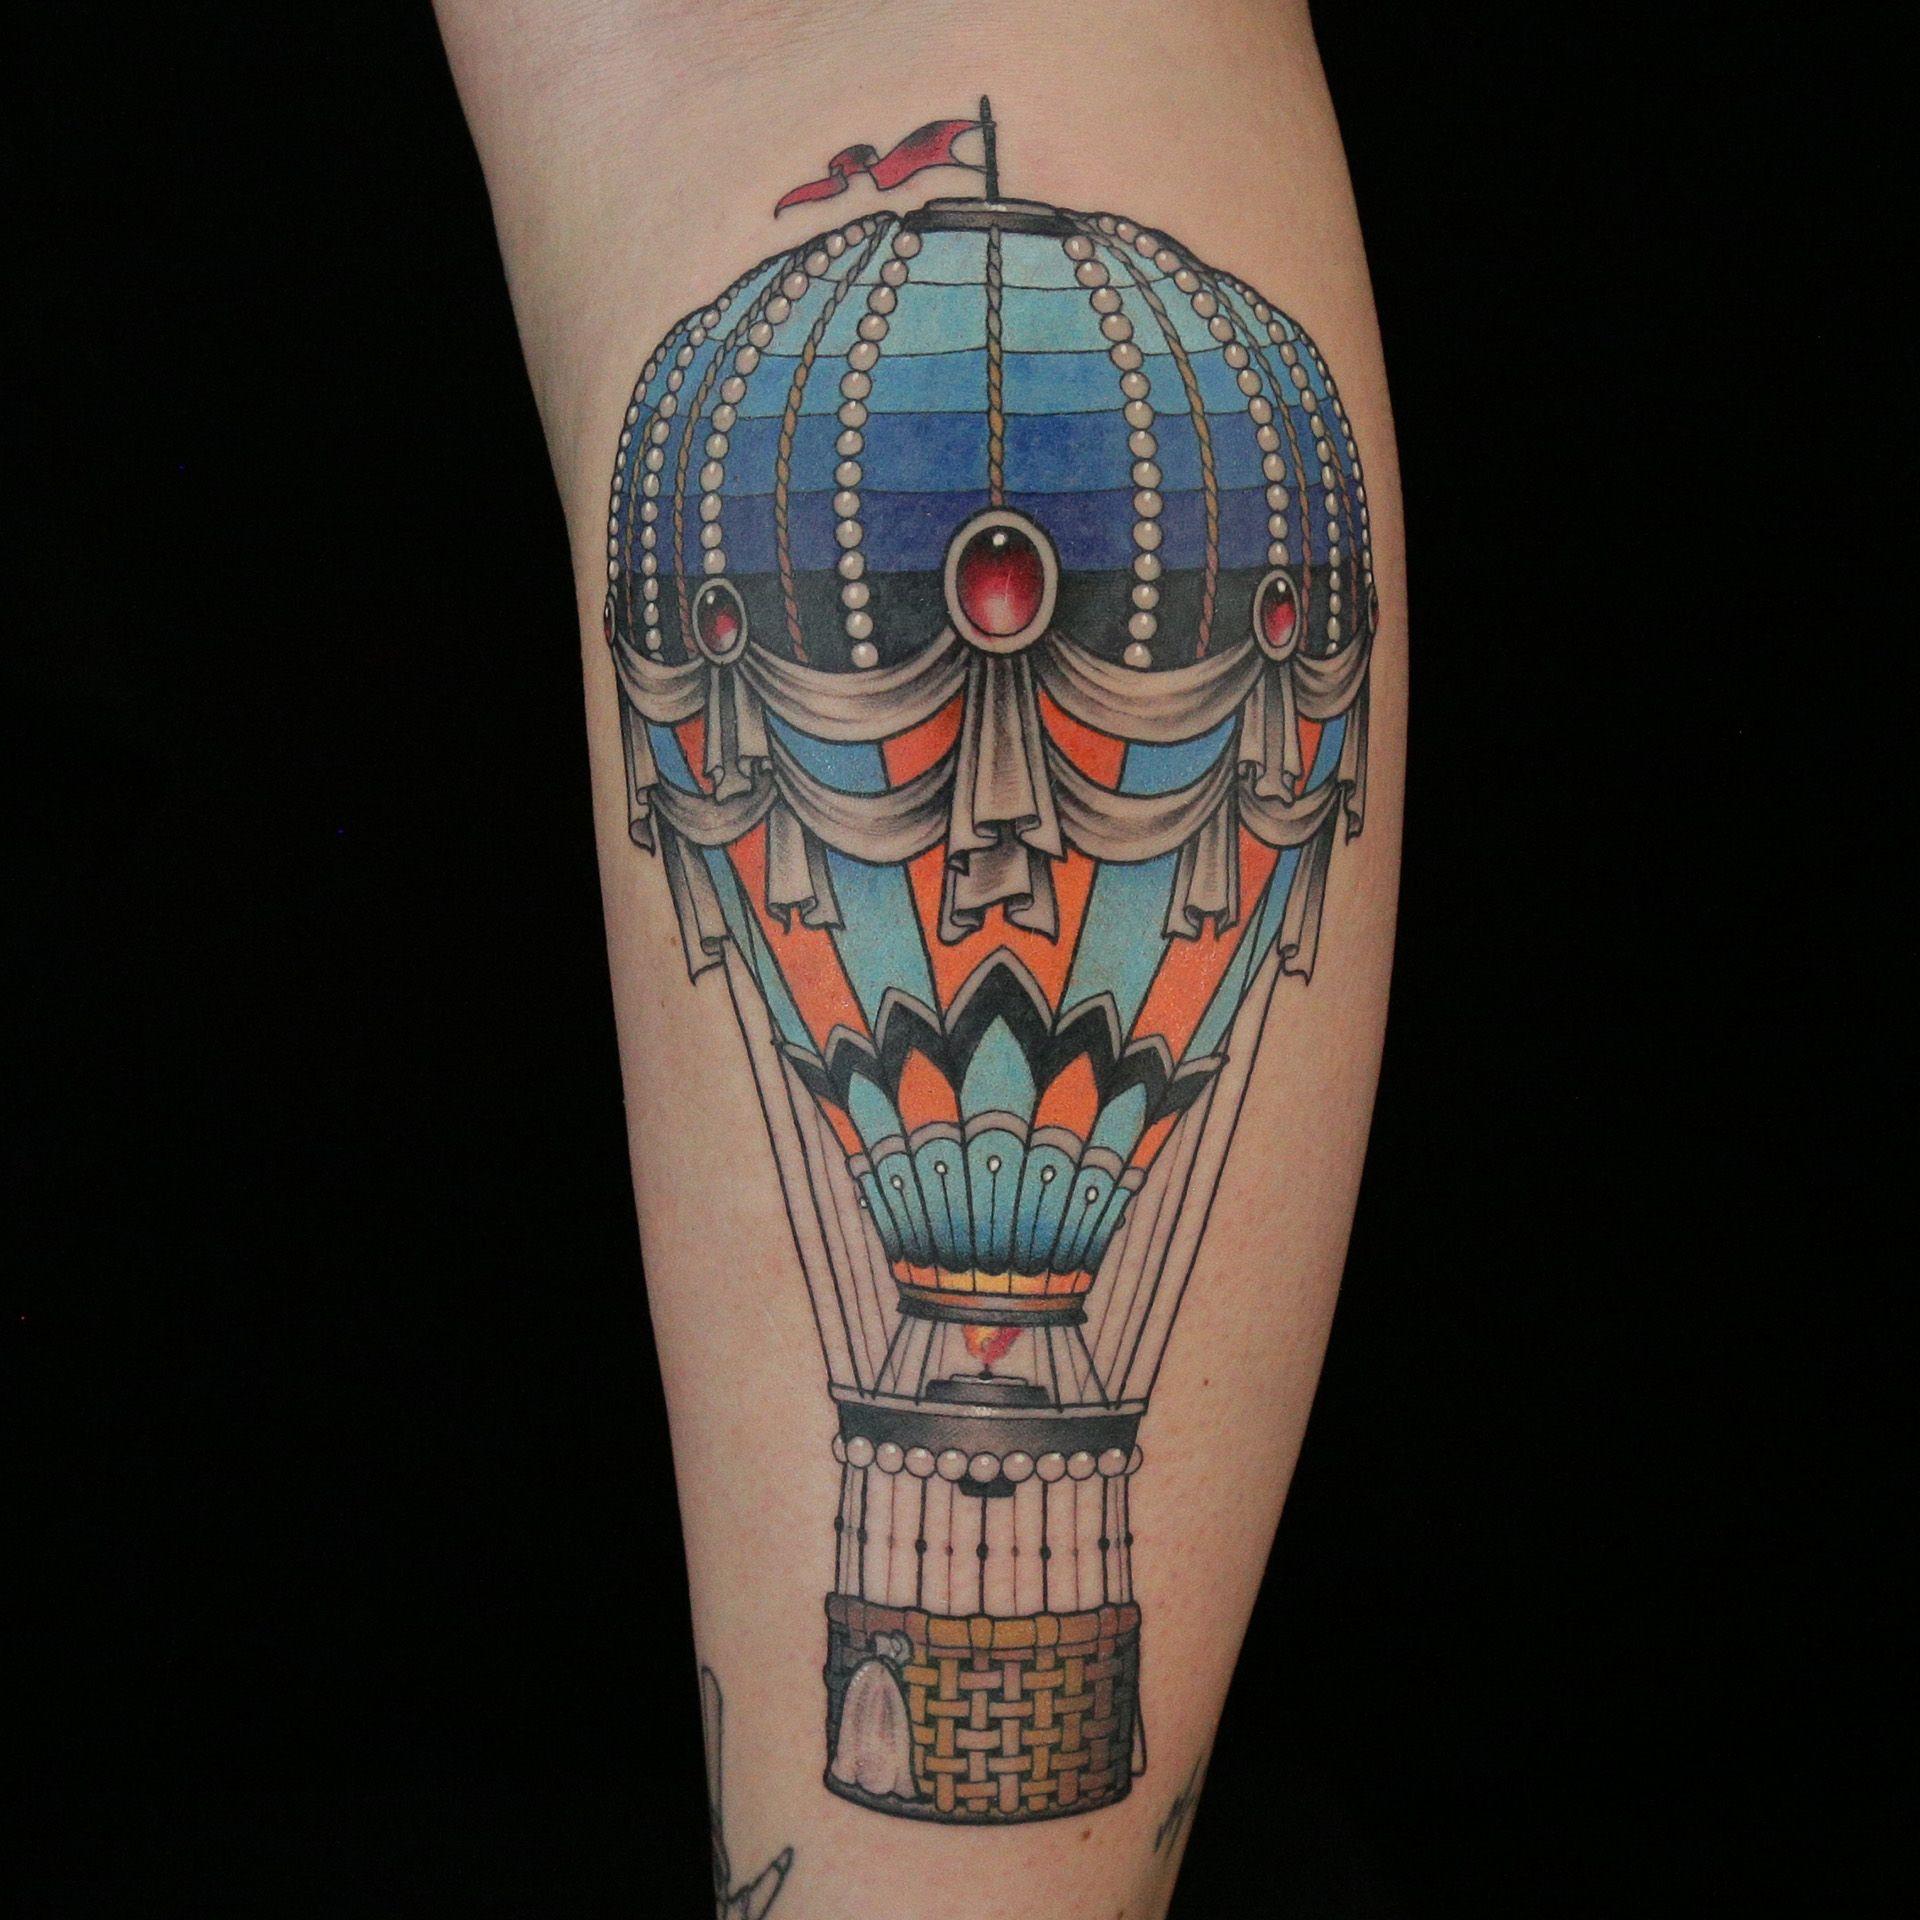 Technicolor Hot Air Balloon Tattoo By Daniel Silva Air Balloon Tattoo Hot Air Balloon Tattoo Balloon Tattoo